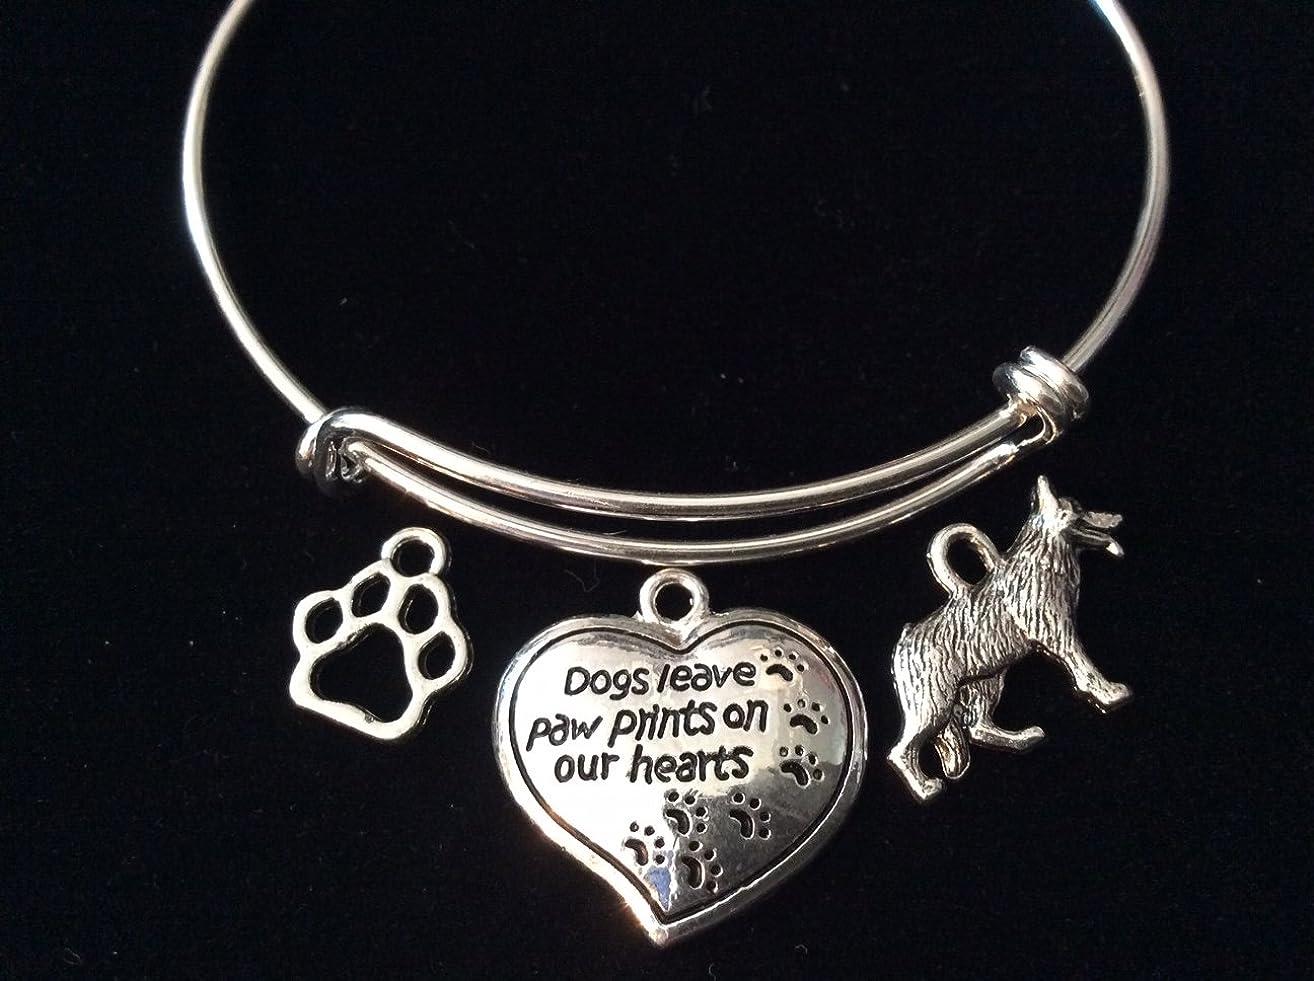 German Shepherd Dogs Leave Paw Prints on Our Hearts Expandable SIlver Charm Bracelet Adjustable Bangle Pet Dog Bone